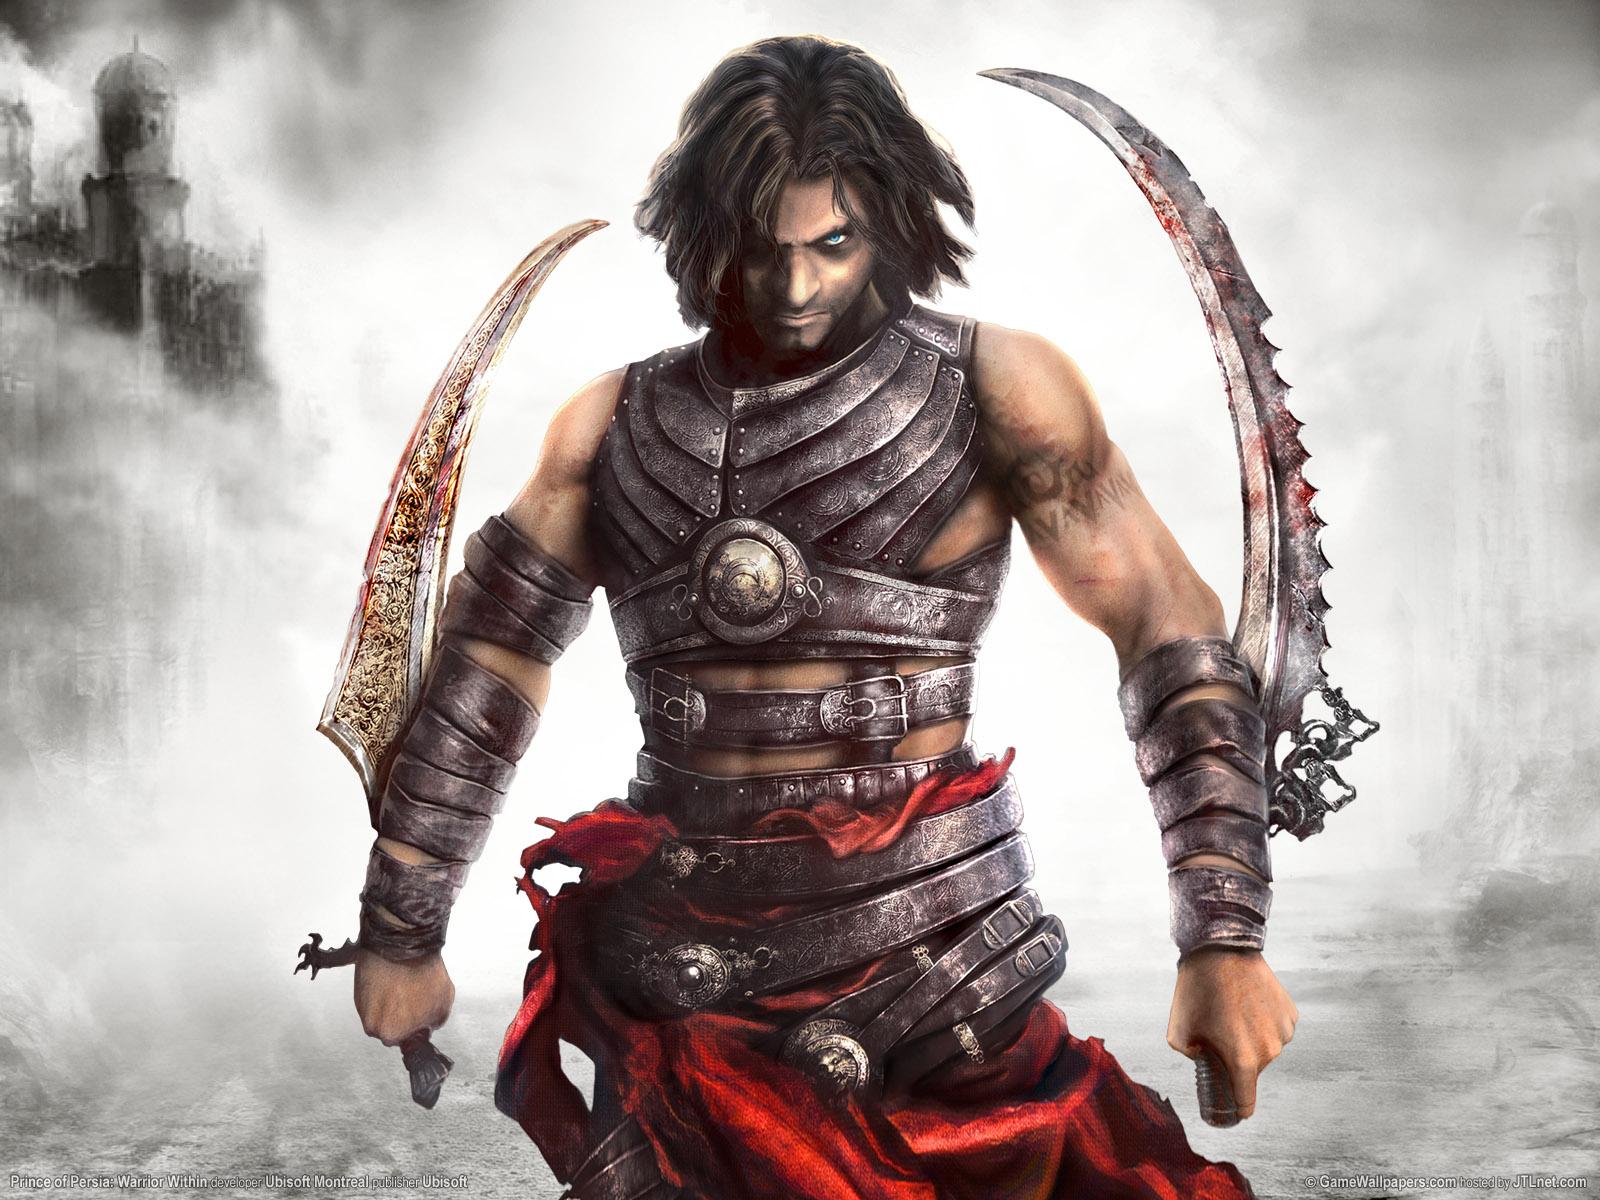 http://1.bp.blogspot.com/_oKJLH-klsUE/S_cBMzlkJfI/AAAAAAAAACM/37W2zd8k0sY/s1600/wallpaper_prince_of_persia_warrior_within_10_1600.jpg